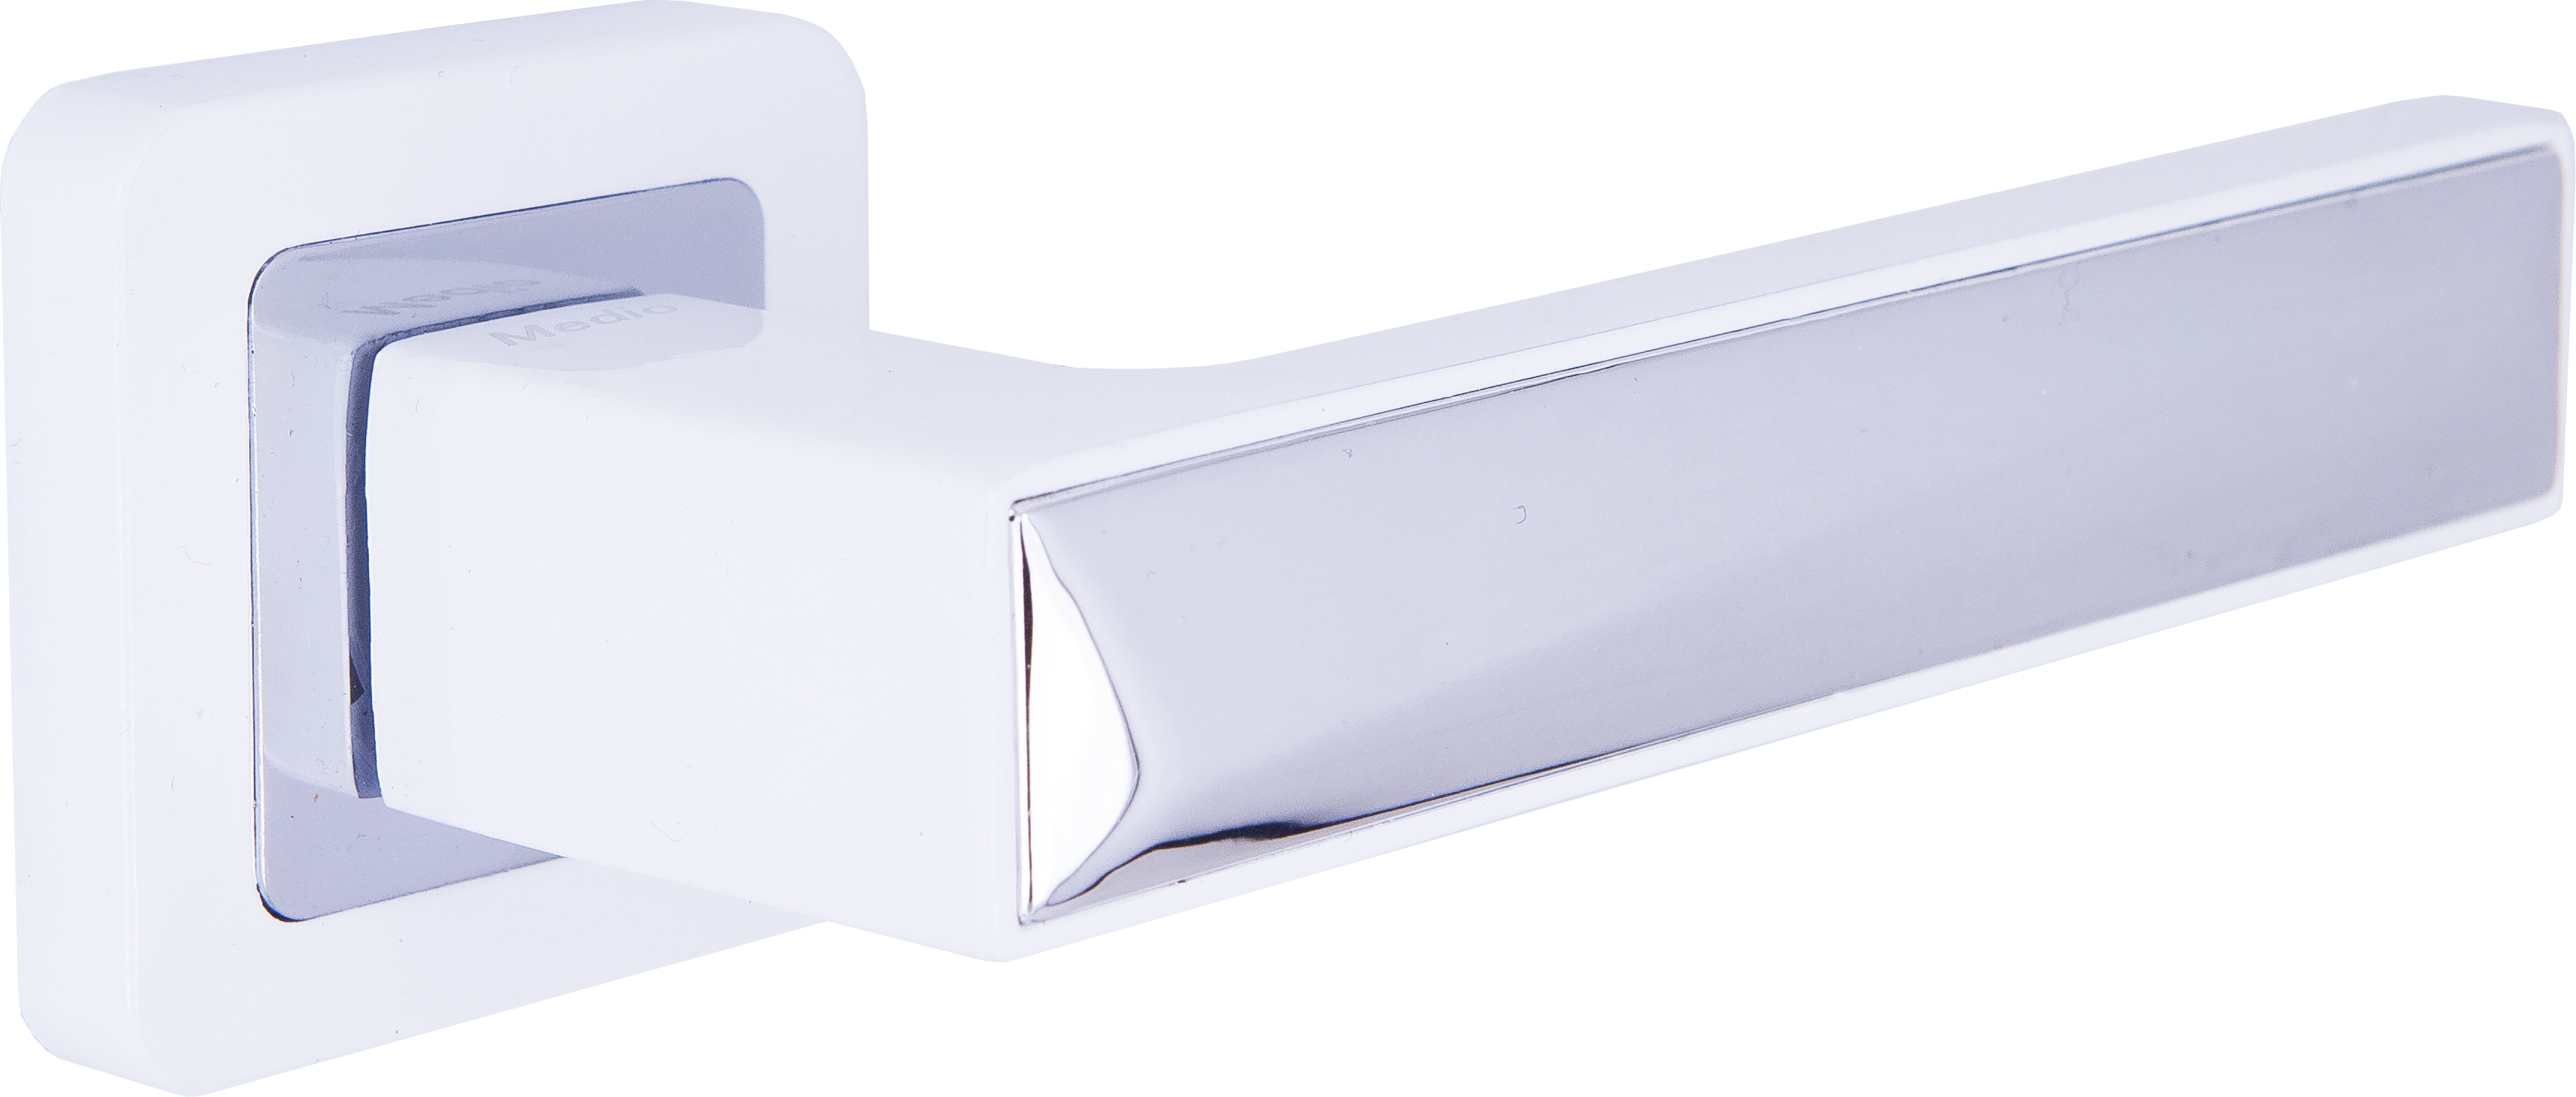 Ручка Медио ML7465-78 WW/CP белый/хром (20 шт)